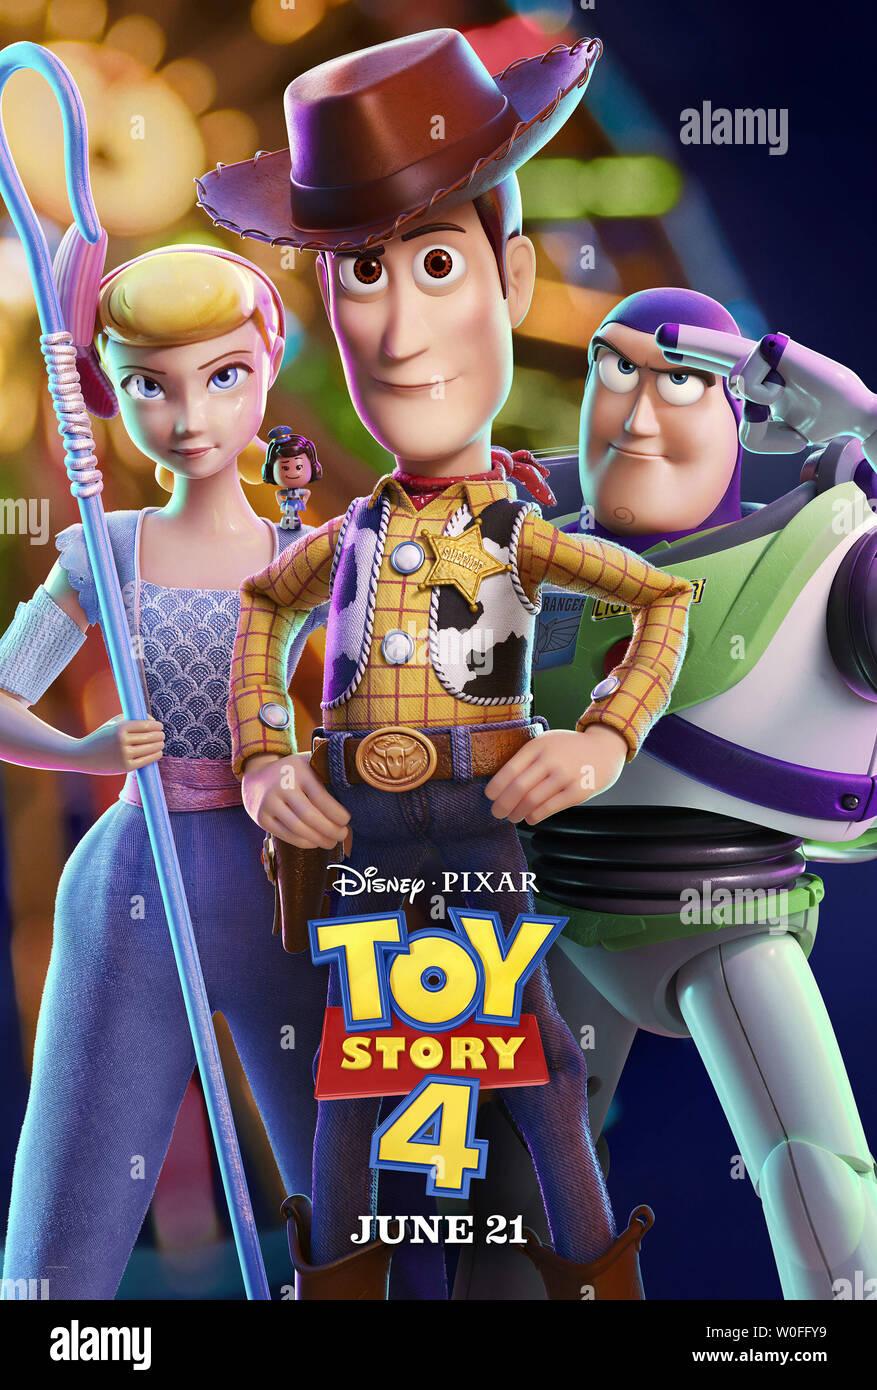 TOY STORY 4, de nous poster, de gauche: Bo Peep (voix: Annie Potts), Giggle McDimples (voix: Ally Maki), Woody (voix: Tom Hanks), Buzz Lightyear (voix: Tim Allen), 2019. © Walt Disney Studios Motion /courtesy Everett Collection Banque D'Images